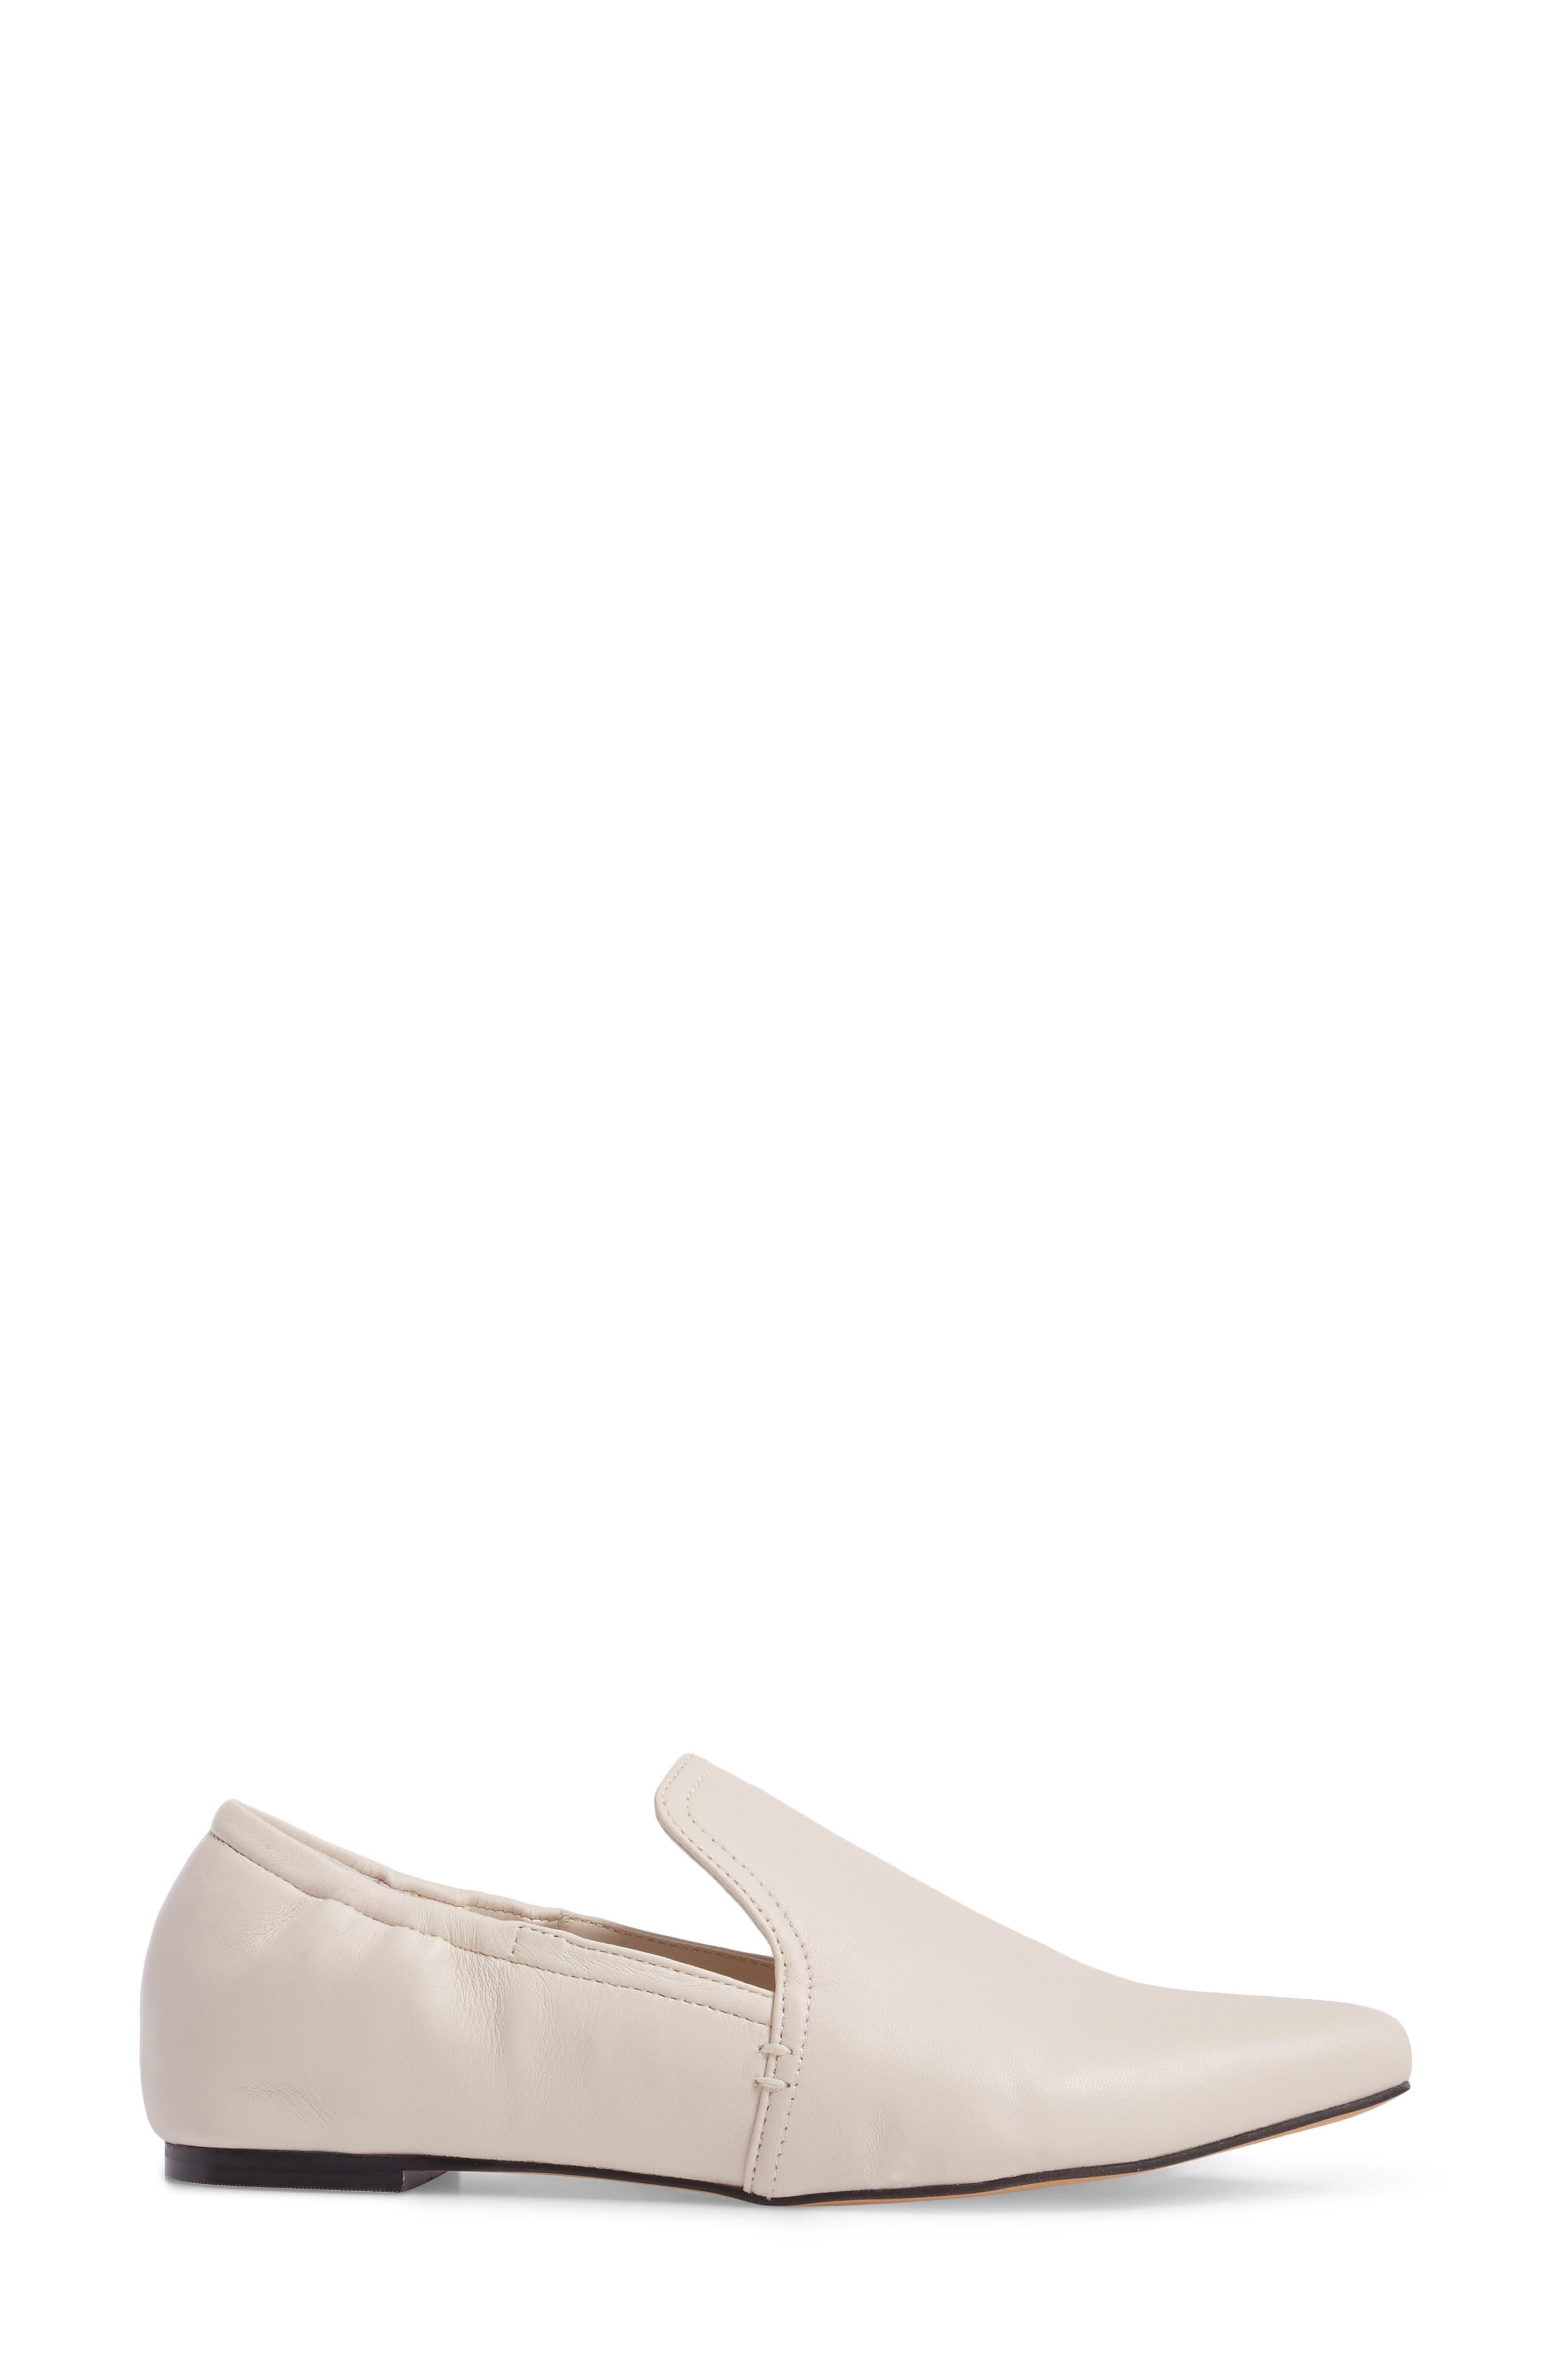 Hamond Loafer,                             Alternate thumbnail 3, color,                             Ivory Leather